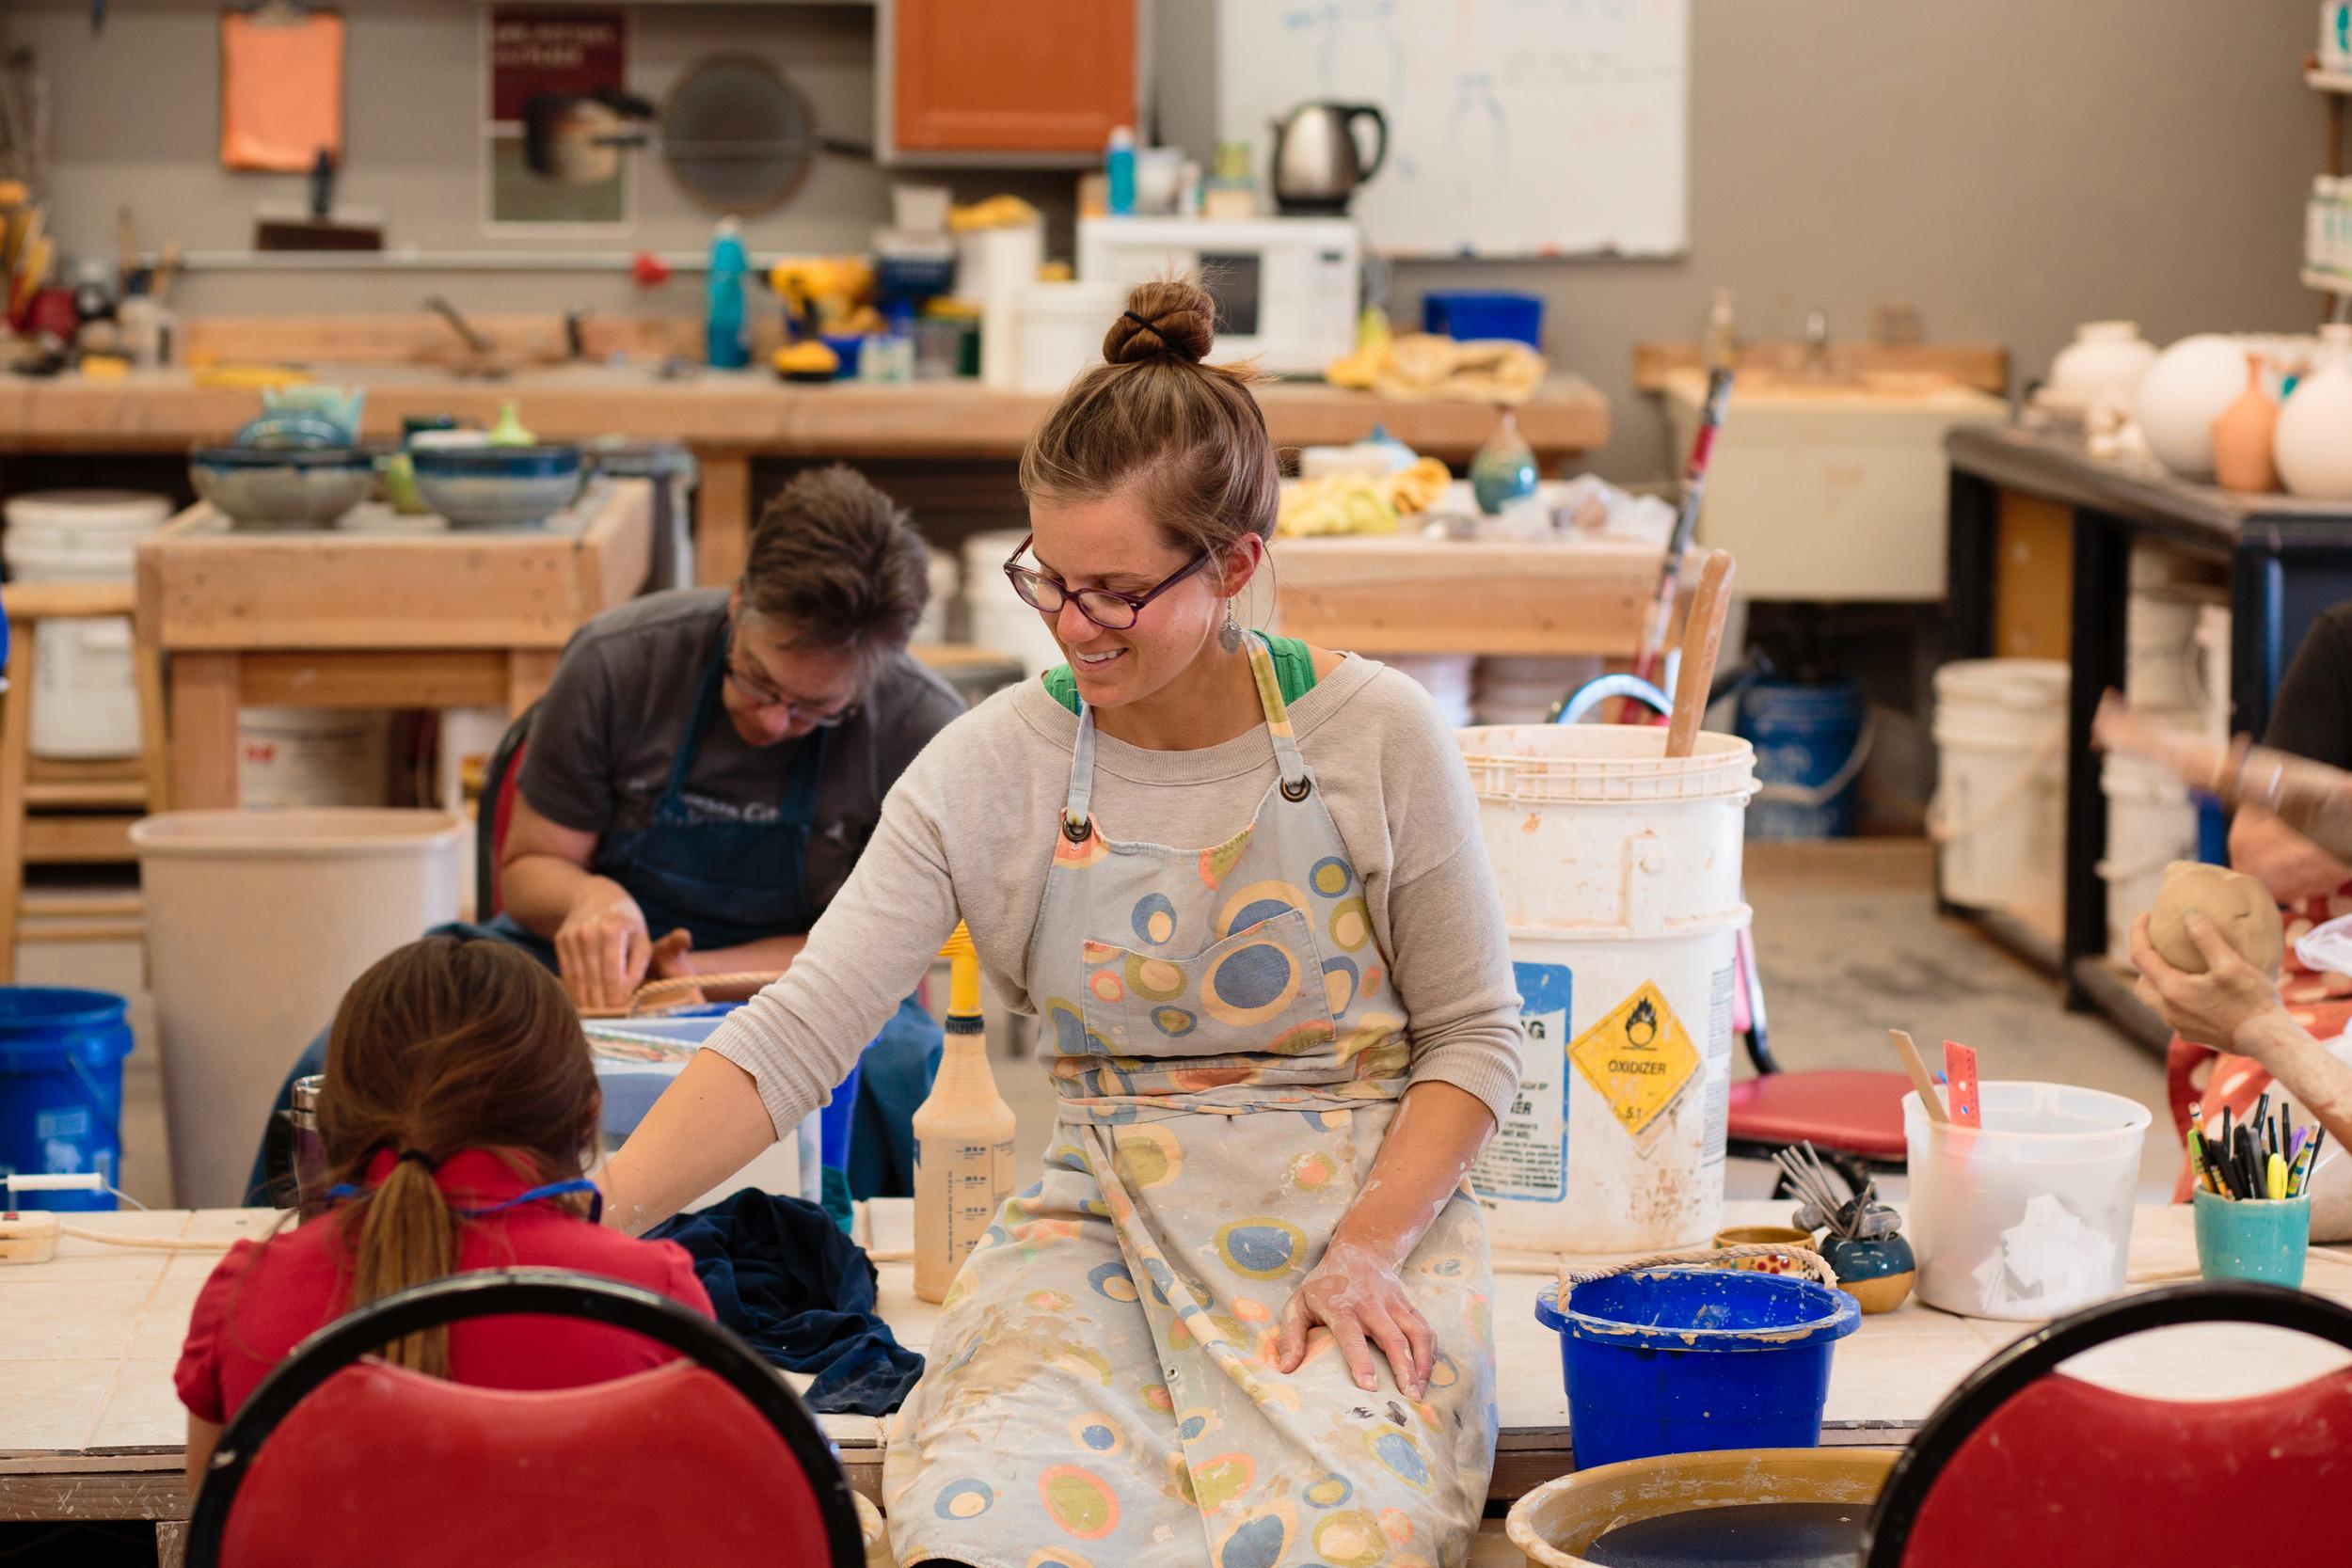 Pottery instructor teaching studio St George UT